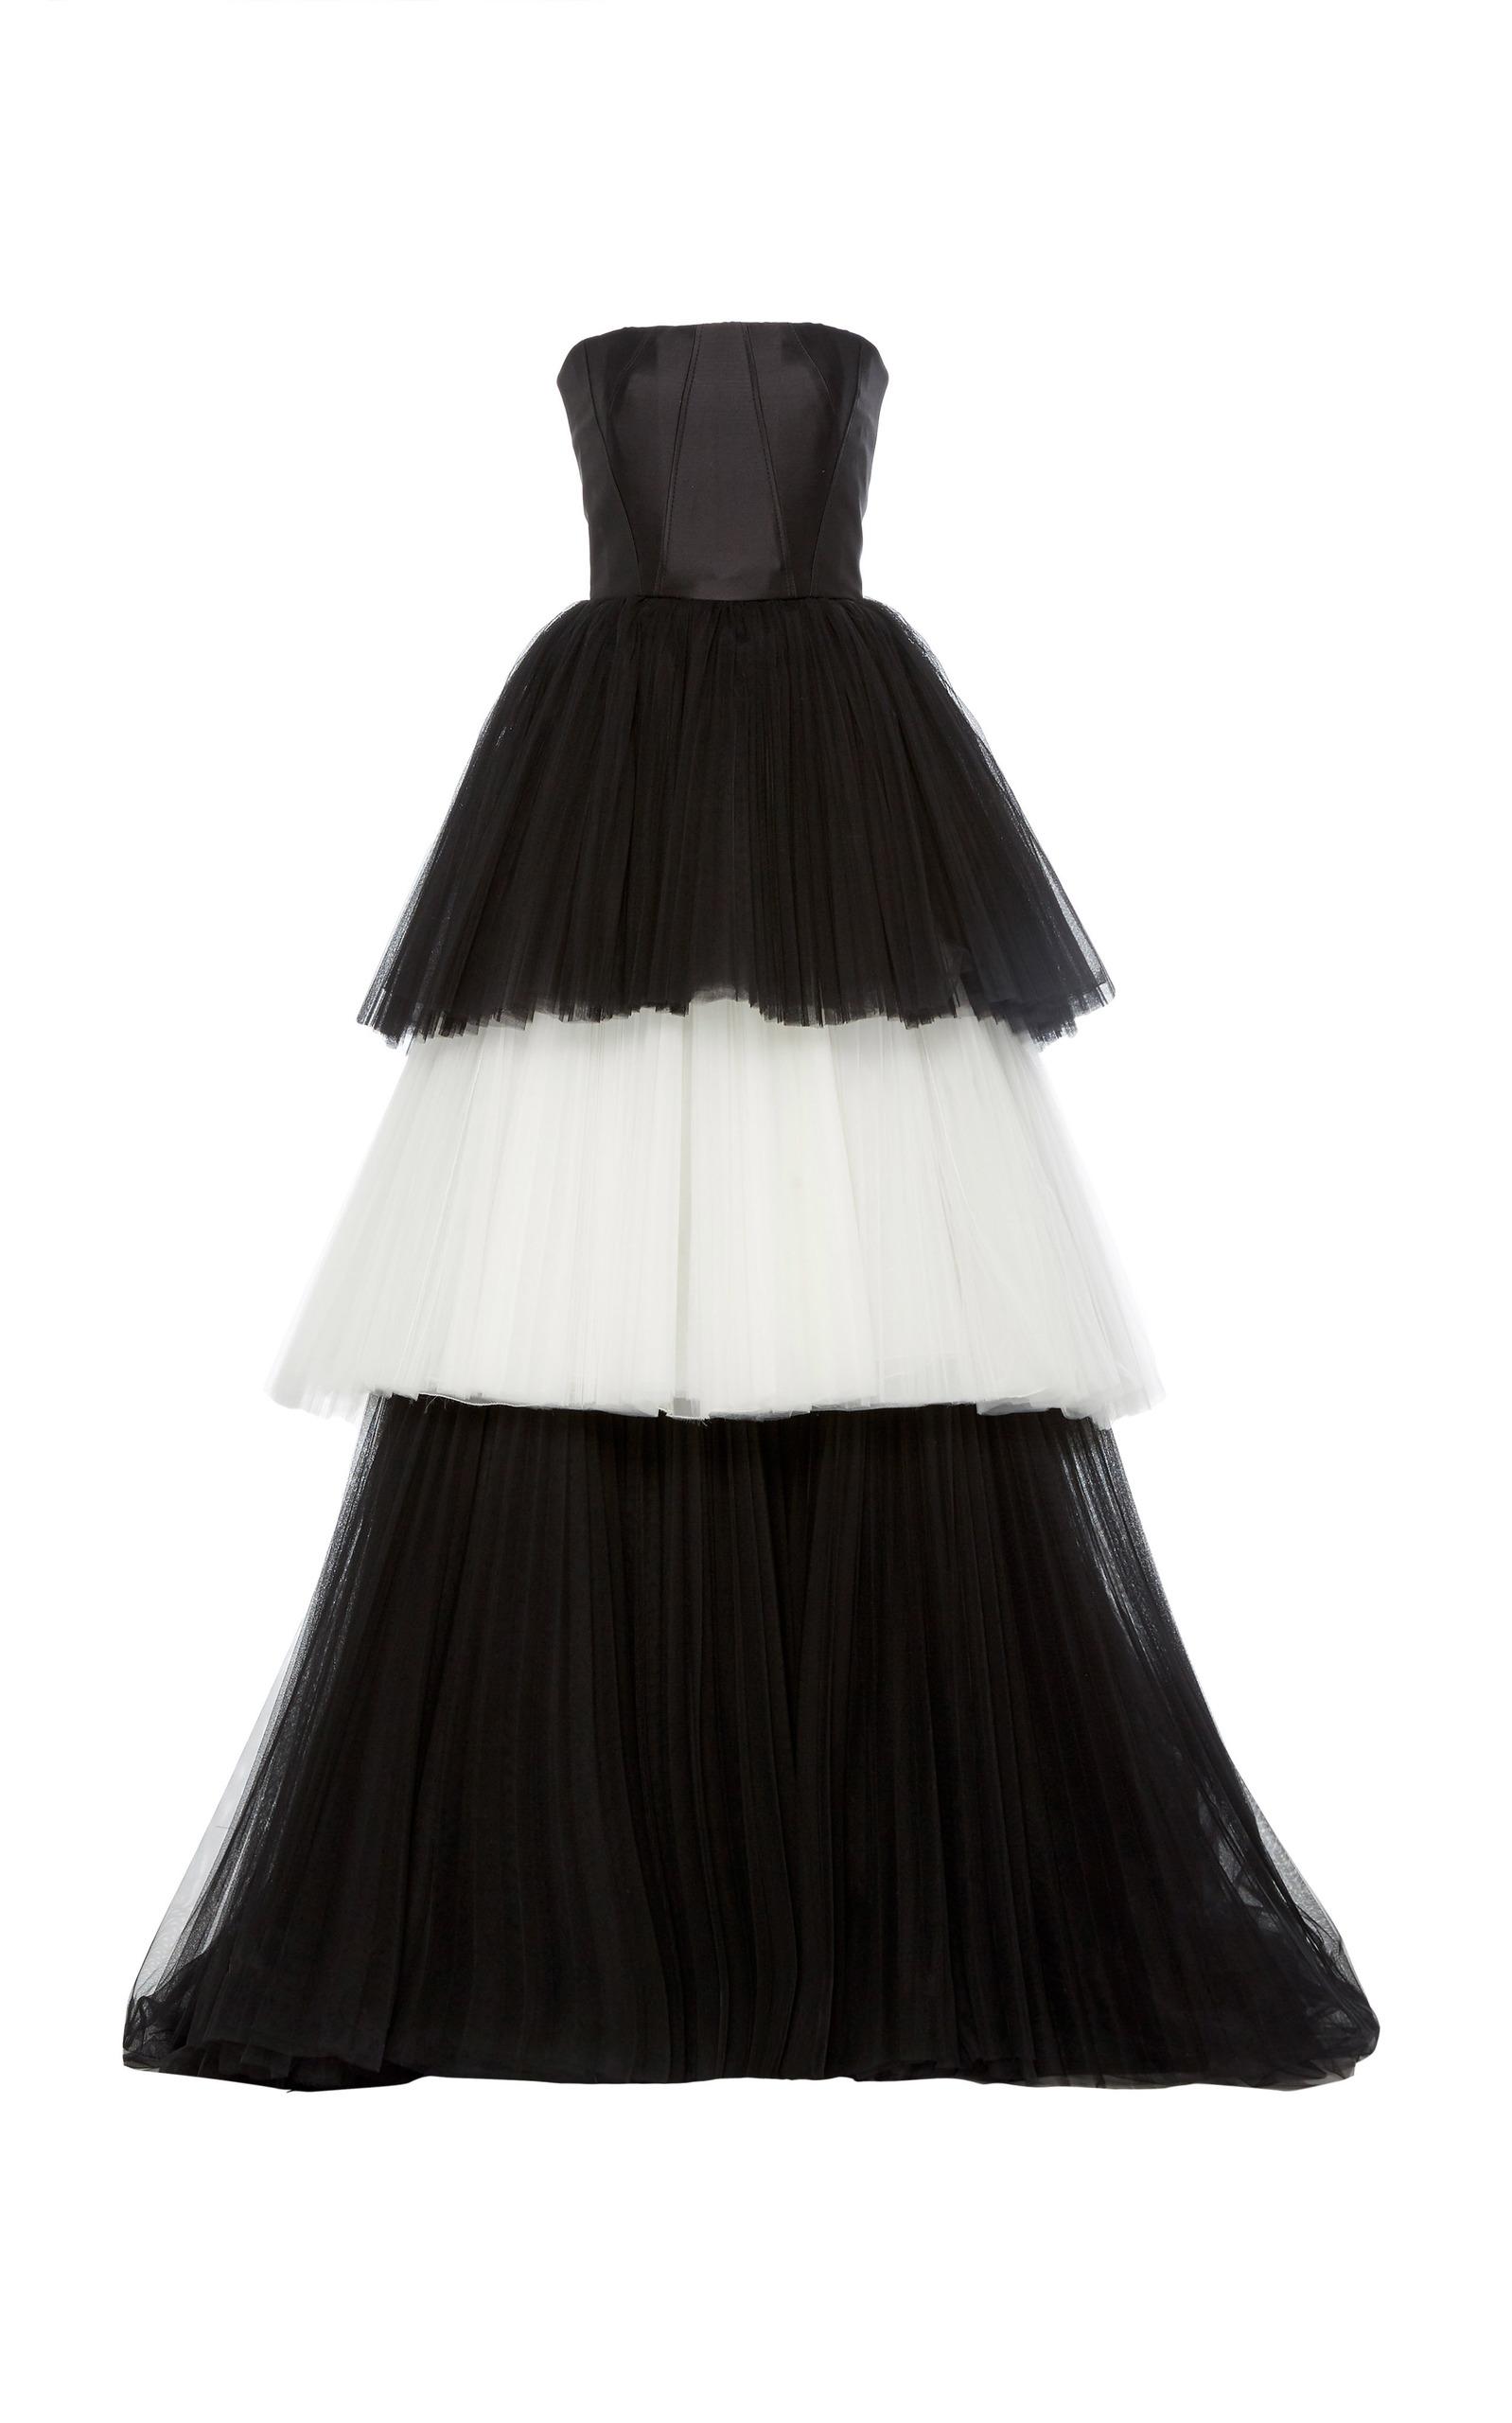 77f460ae64cd Mikado Bustier Tulle Ball Gown by Carolina Herrera   Moda Operandi